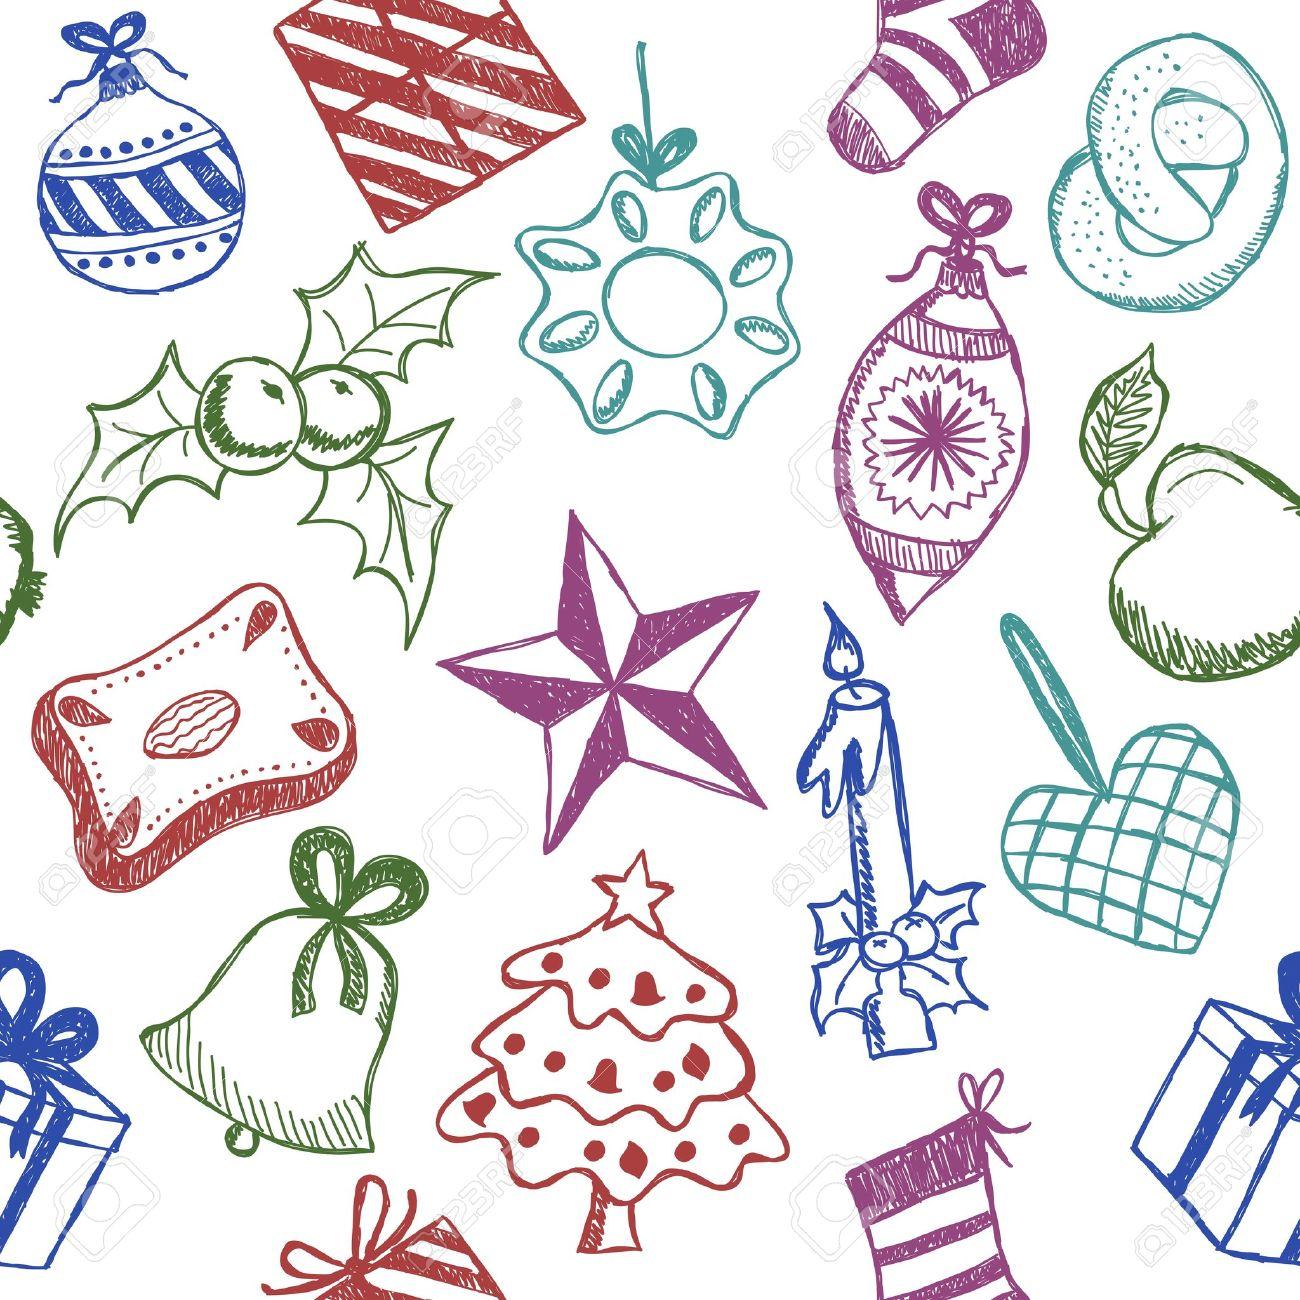 Illustration of christmas symbols, hand drawn style, seamless pattern Stock Vector - 15799556